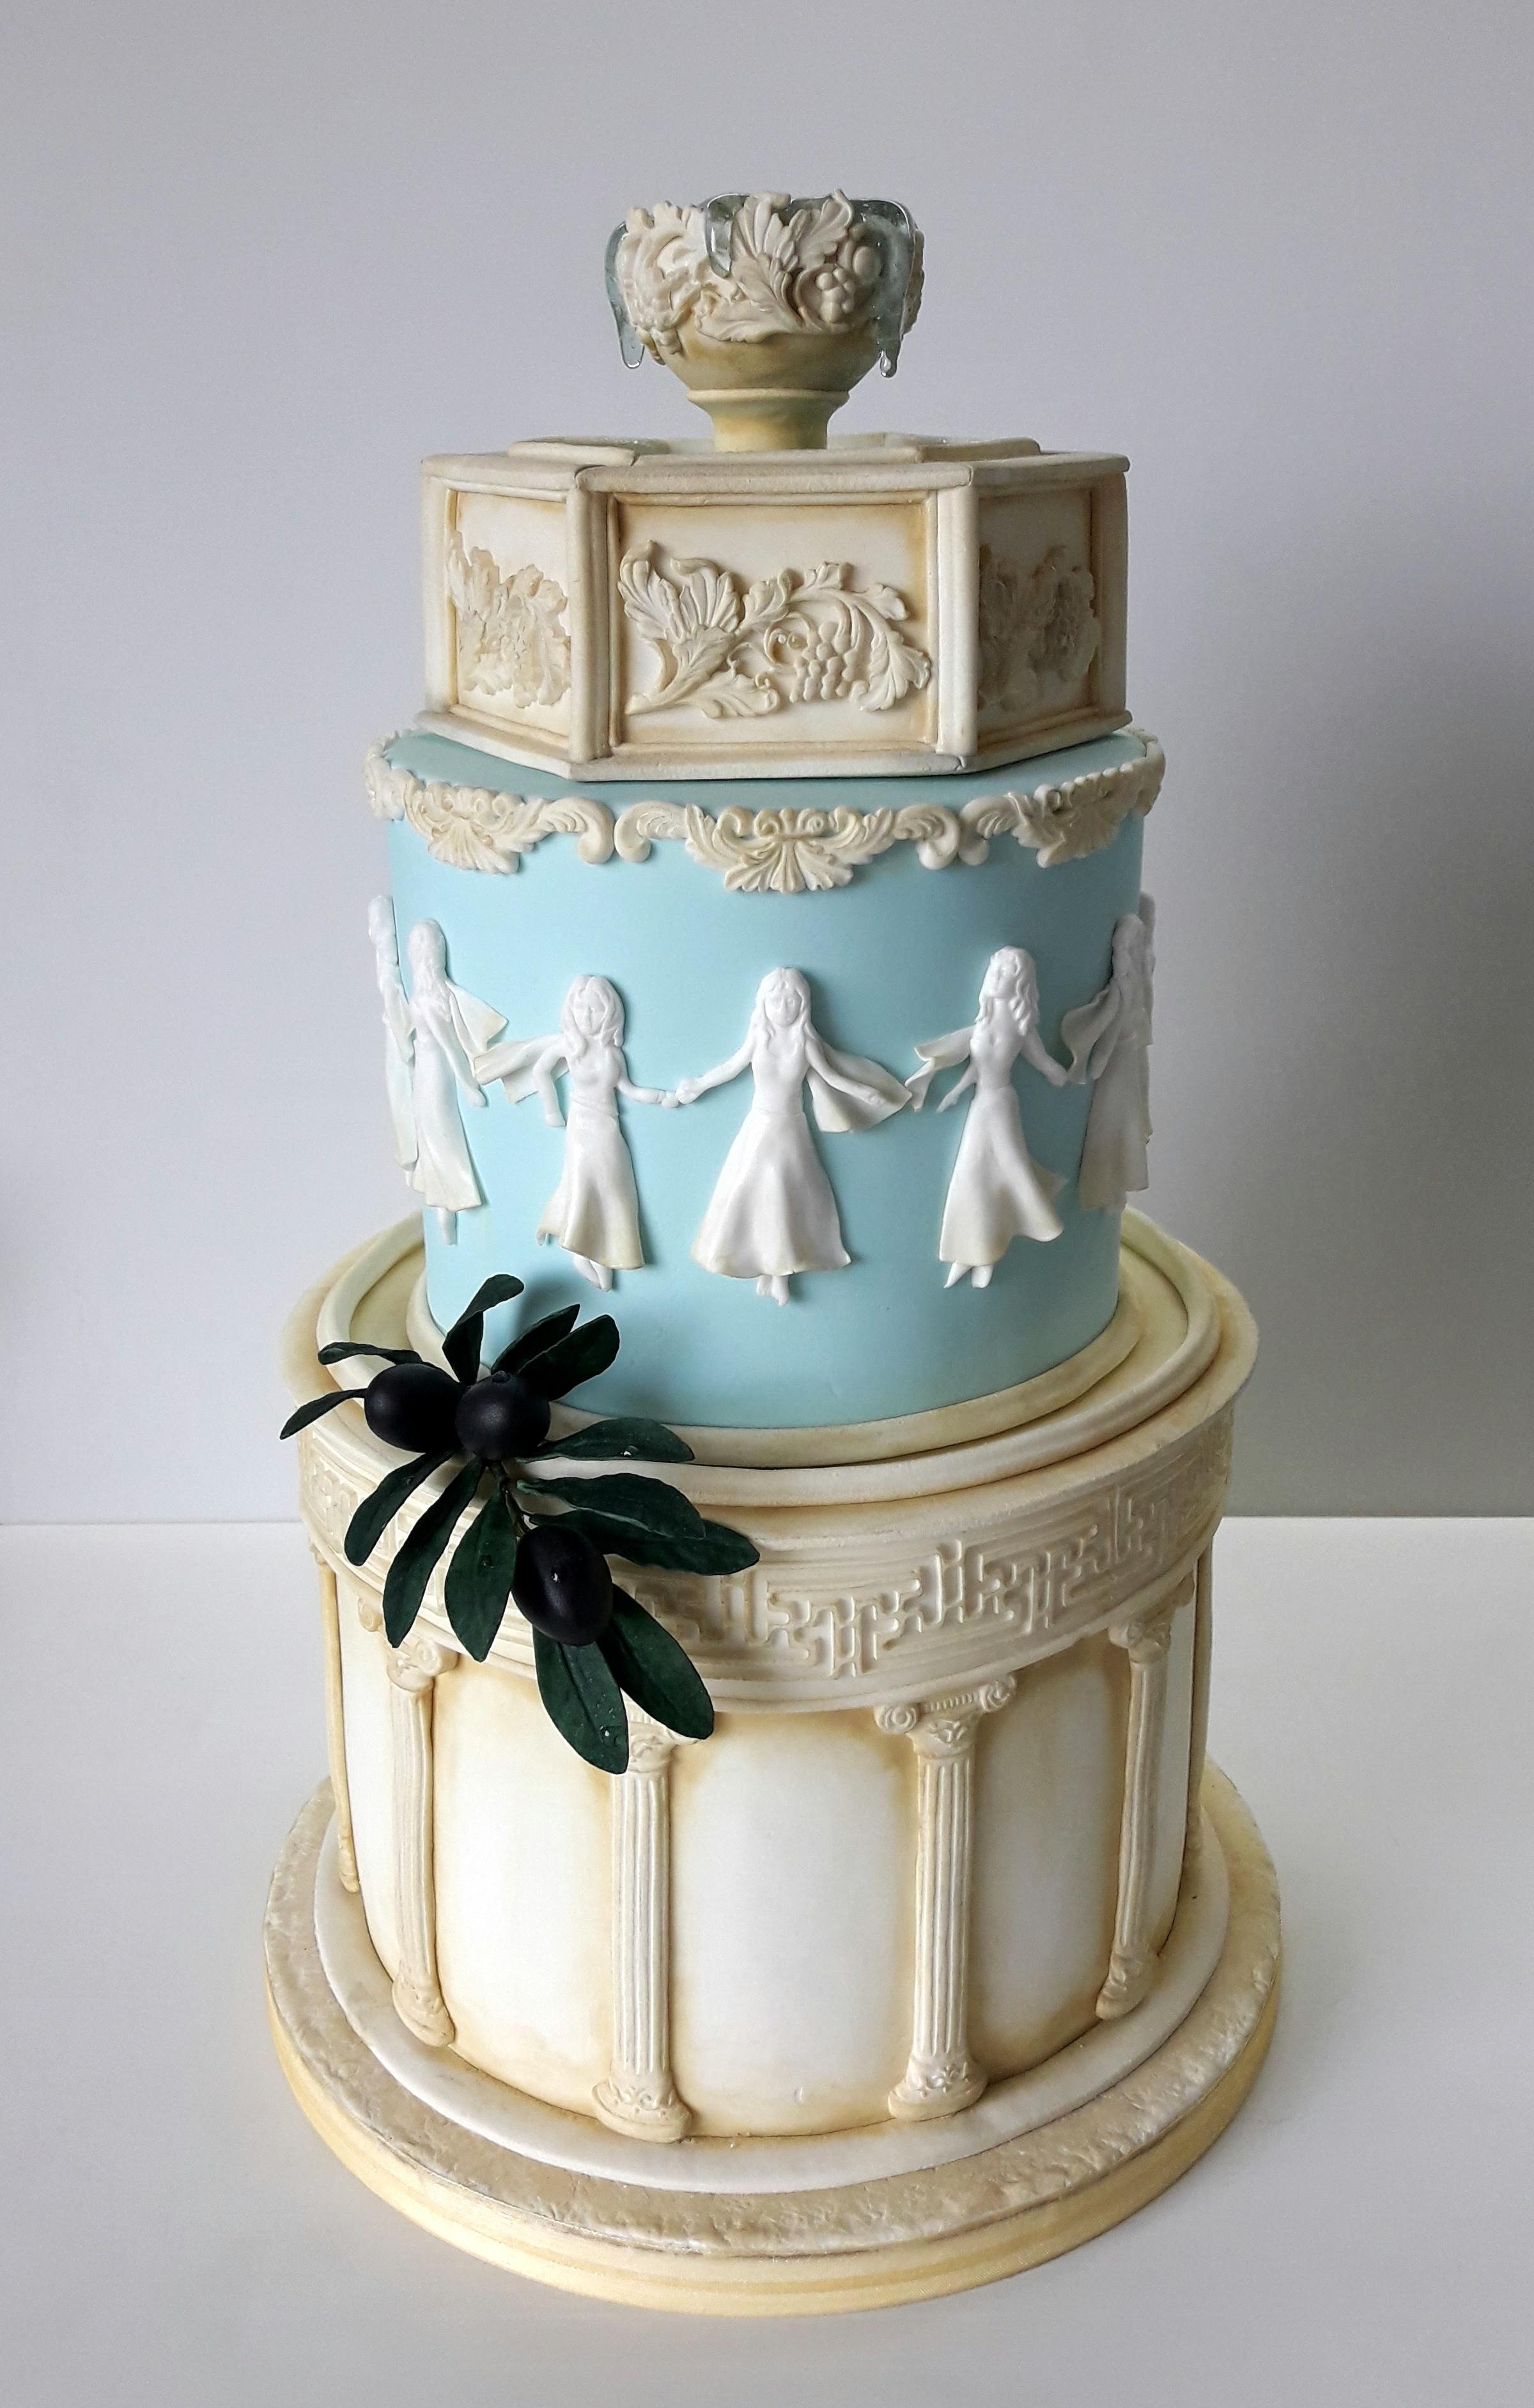 Greek themed fondant wedding cake